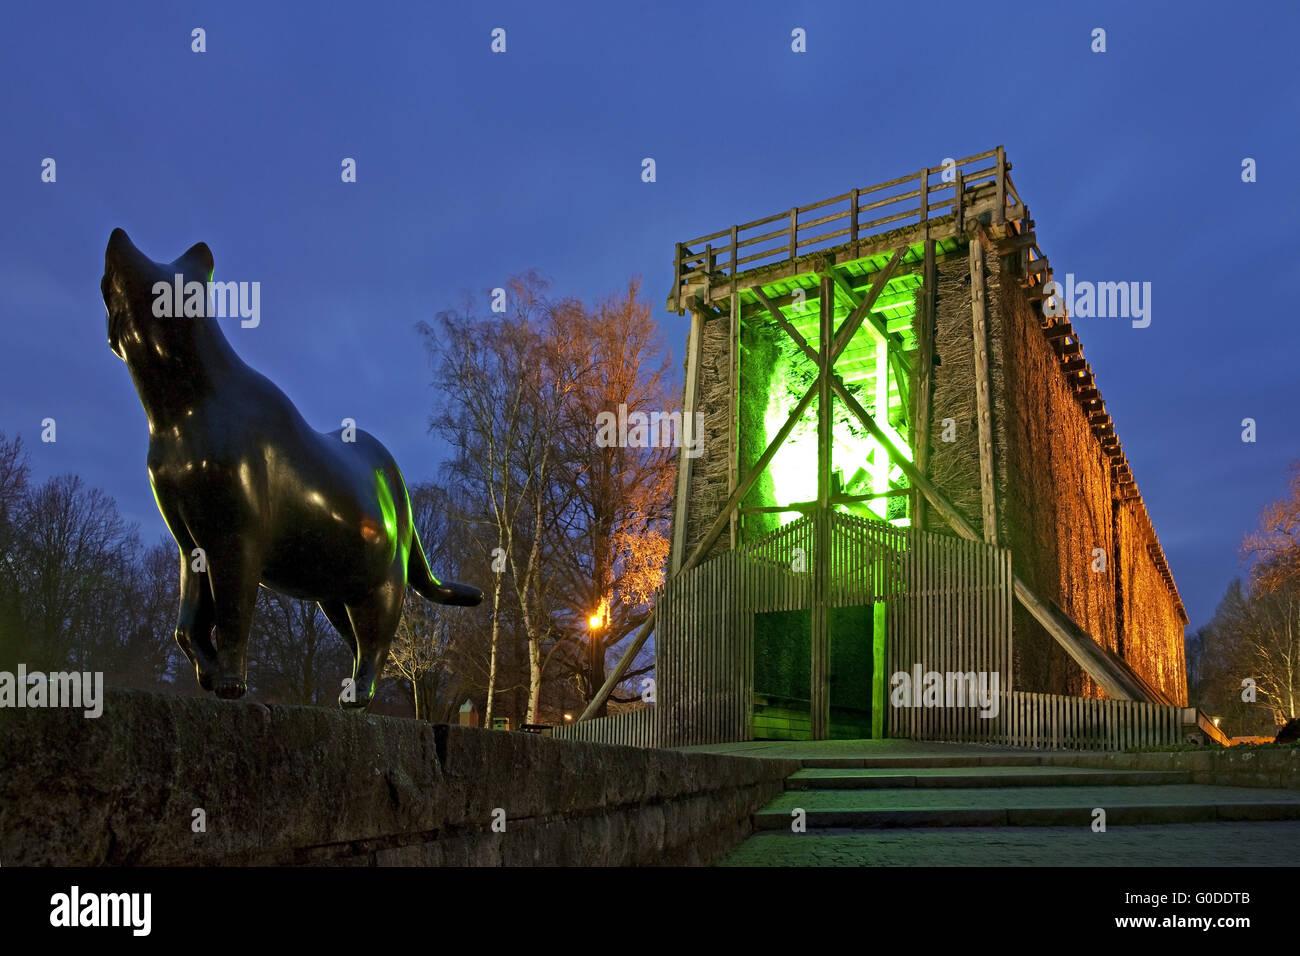 illuminated graduation tower in Bad Sassendorf Stock Photo